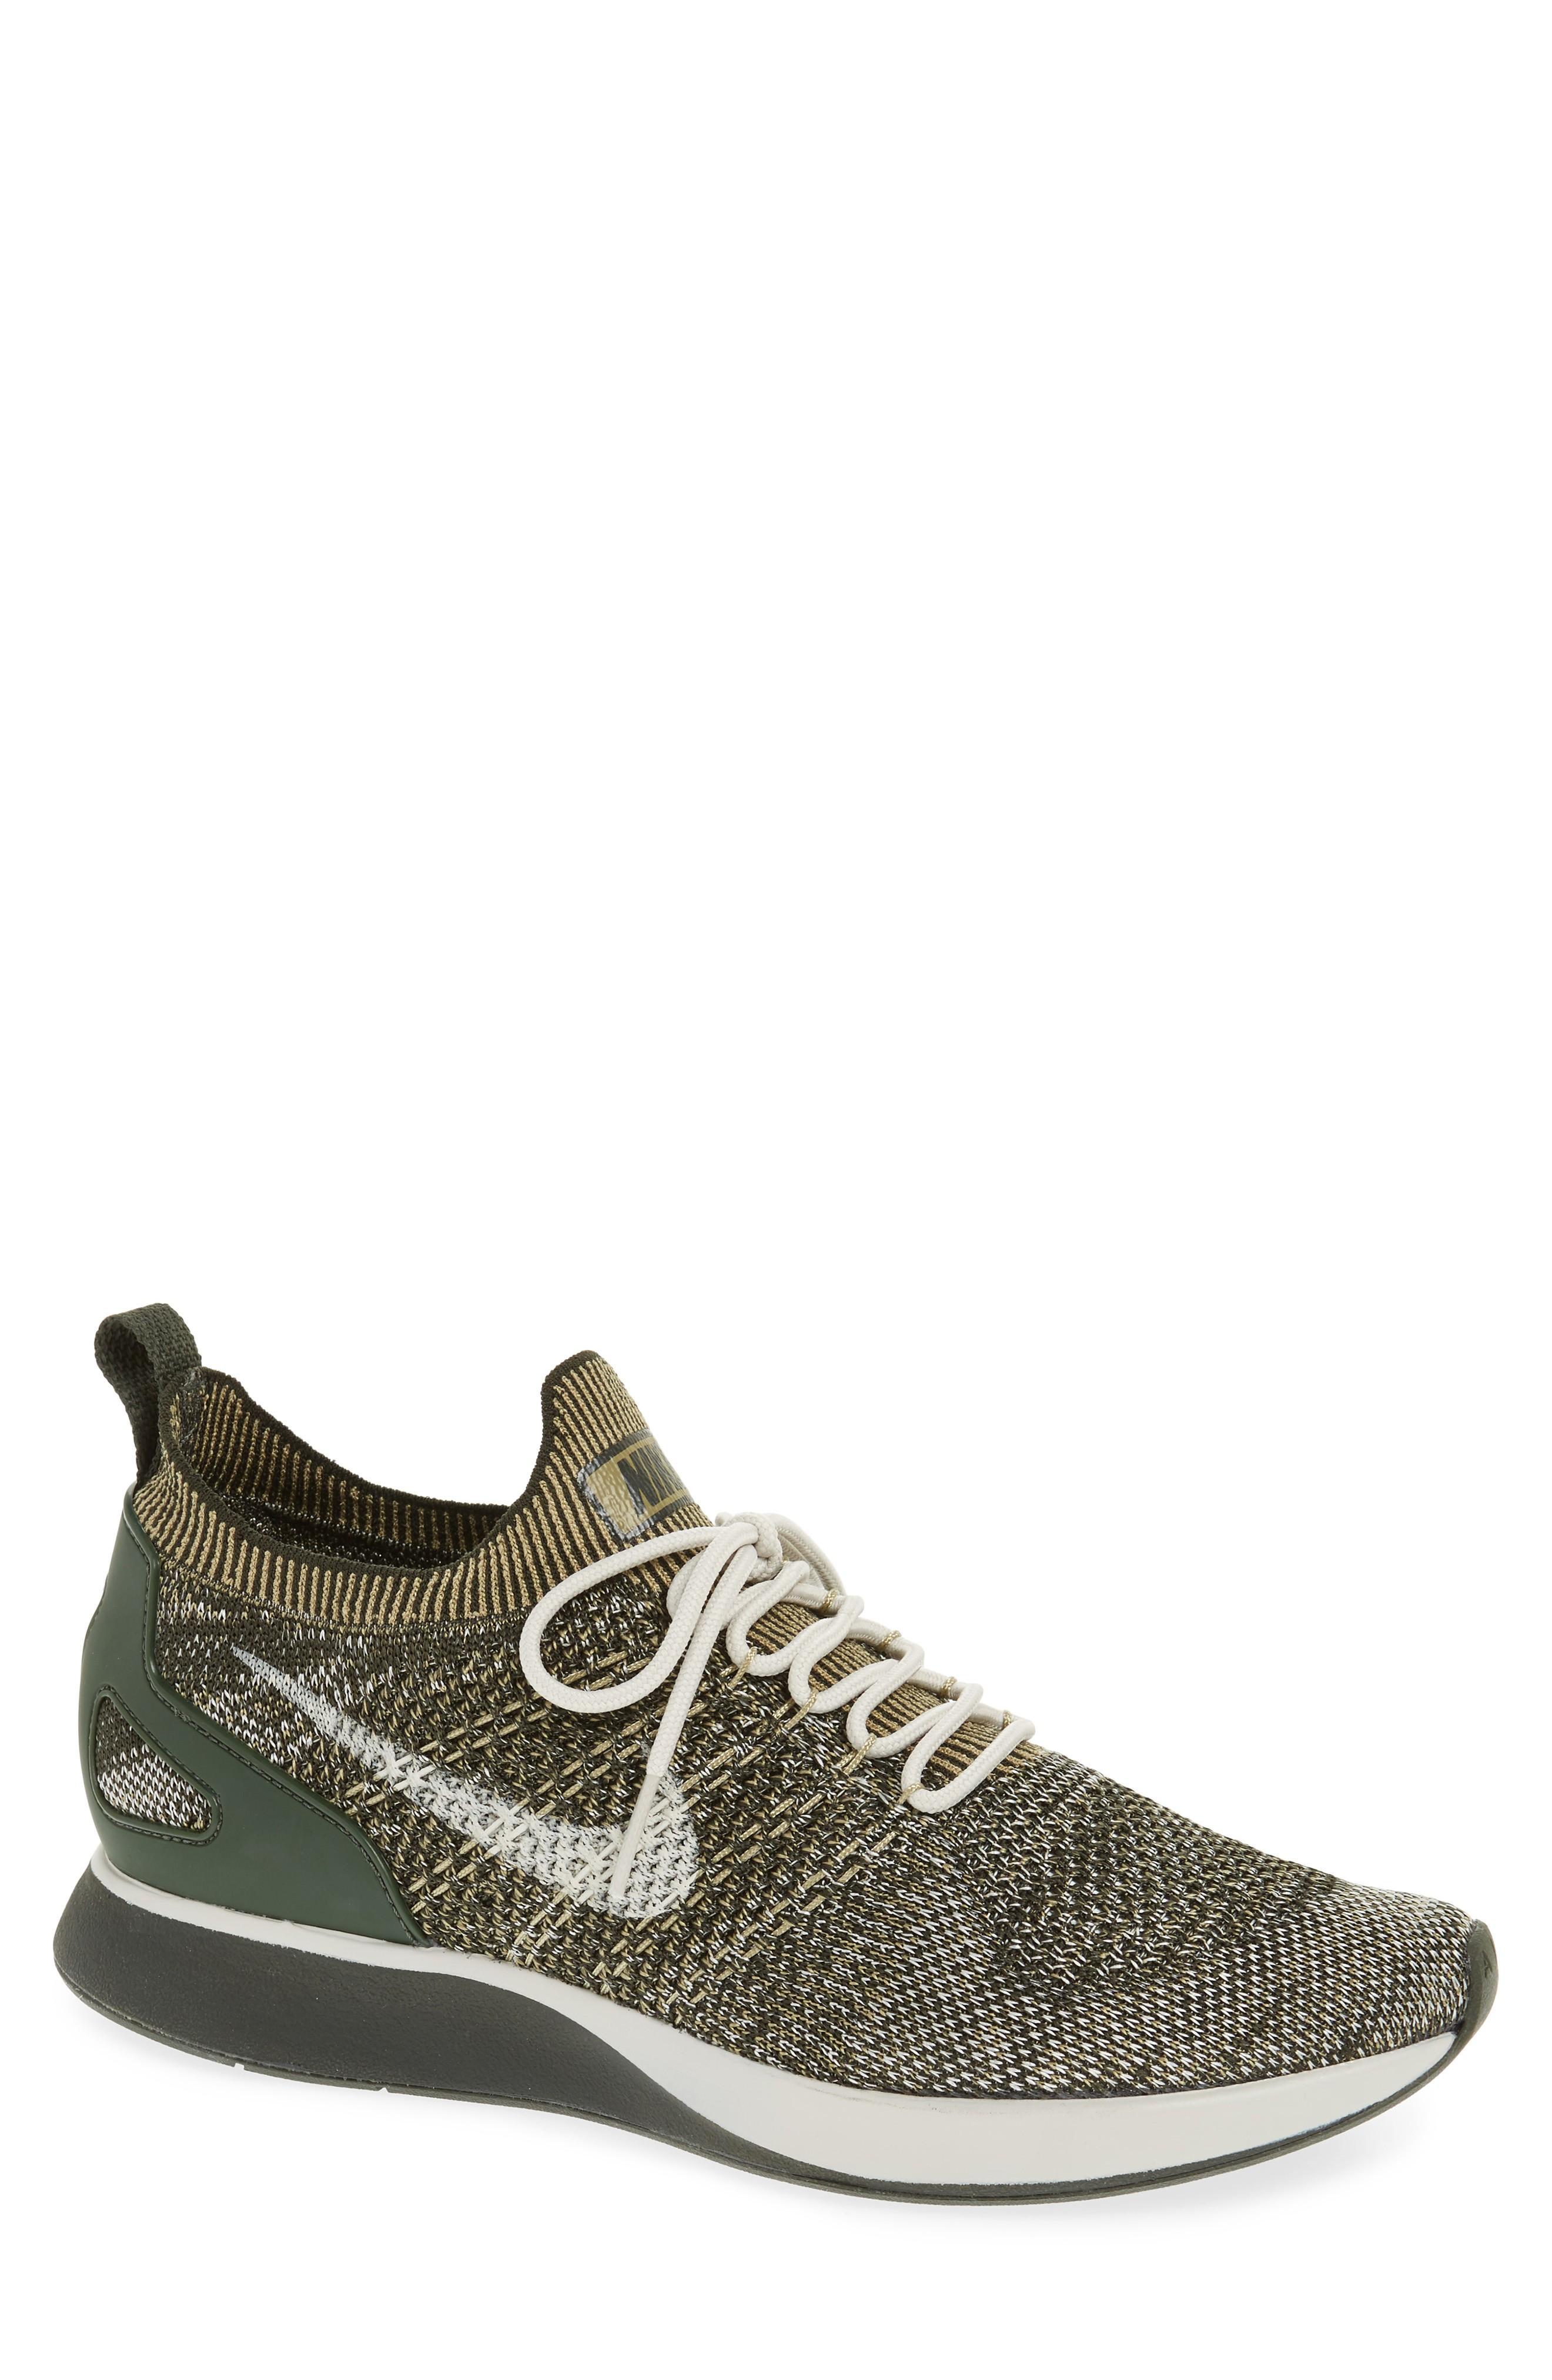 f2d34ffc1237 Nike Air Zoom Mariah Flyknit Racer Sneaker In Sequoia  Olive  Light Bone